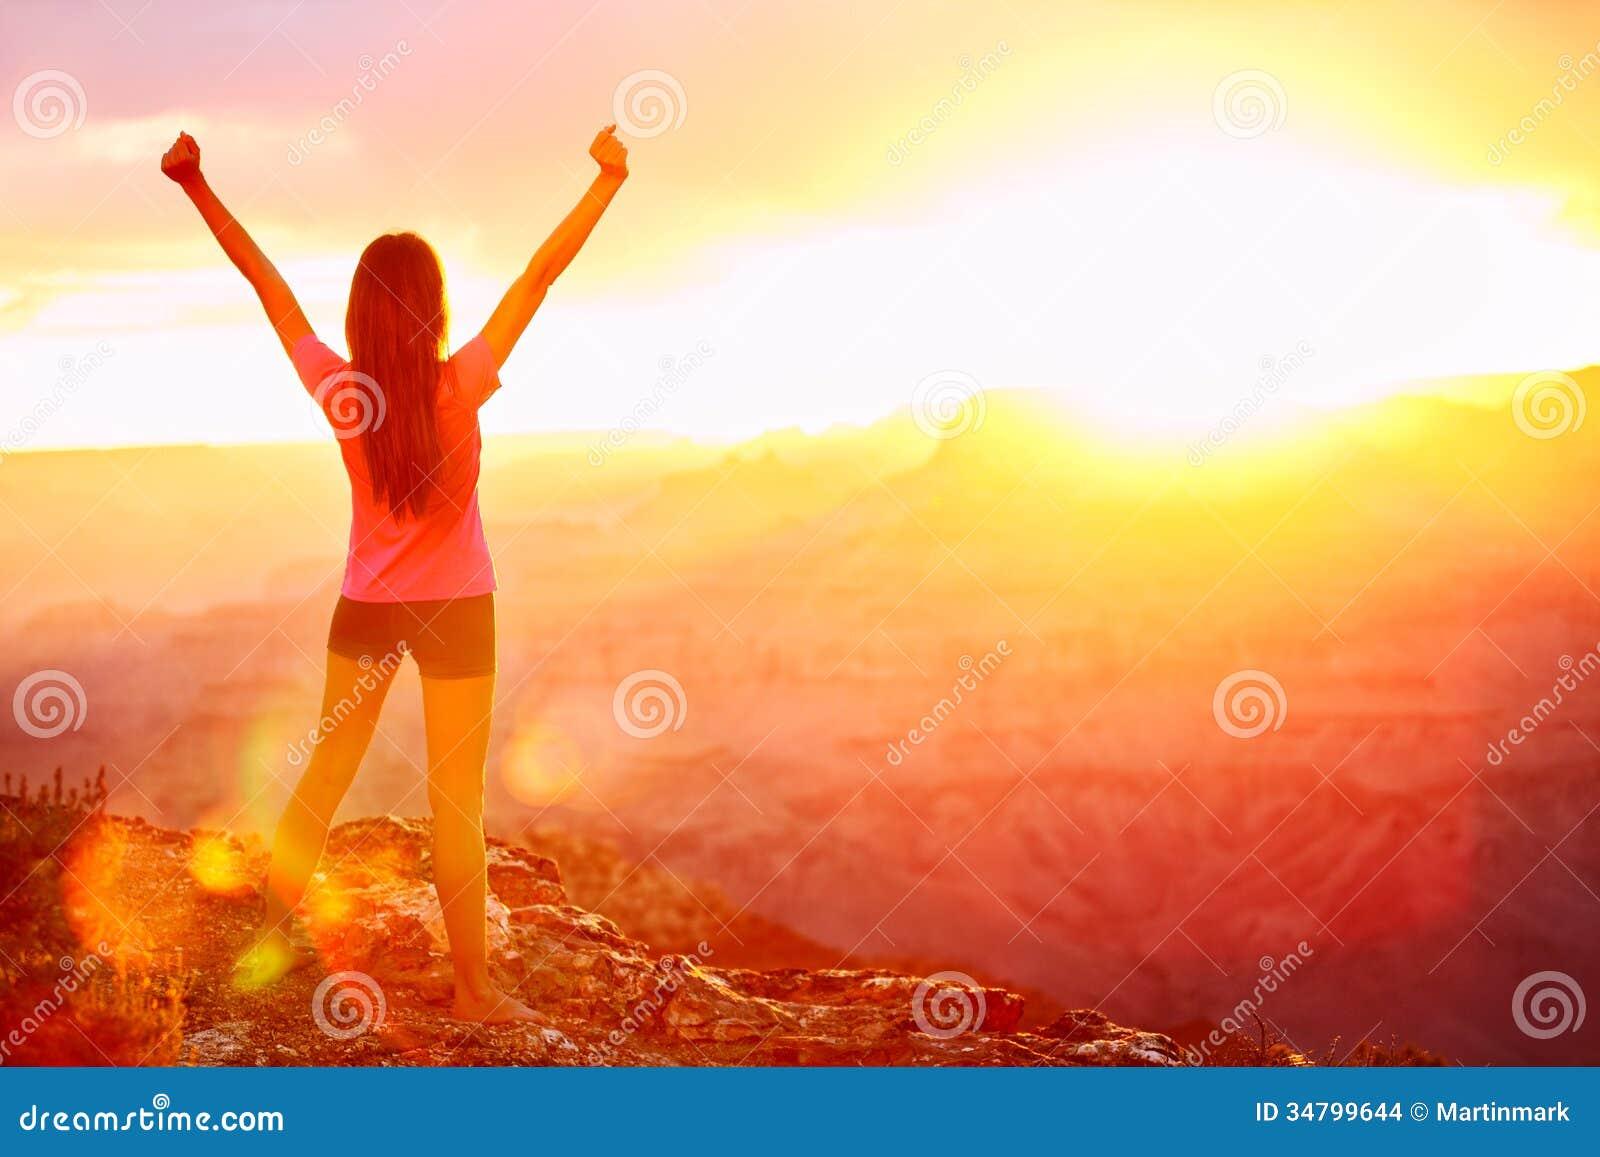 libert et aventure femme heureuse grand canyon images stock image 34799644. Black Bedroom Furniture Sets. Home Design Ideas